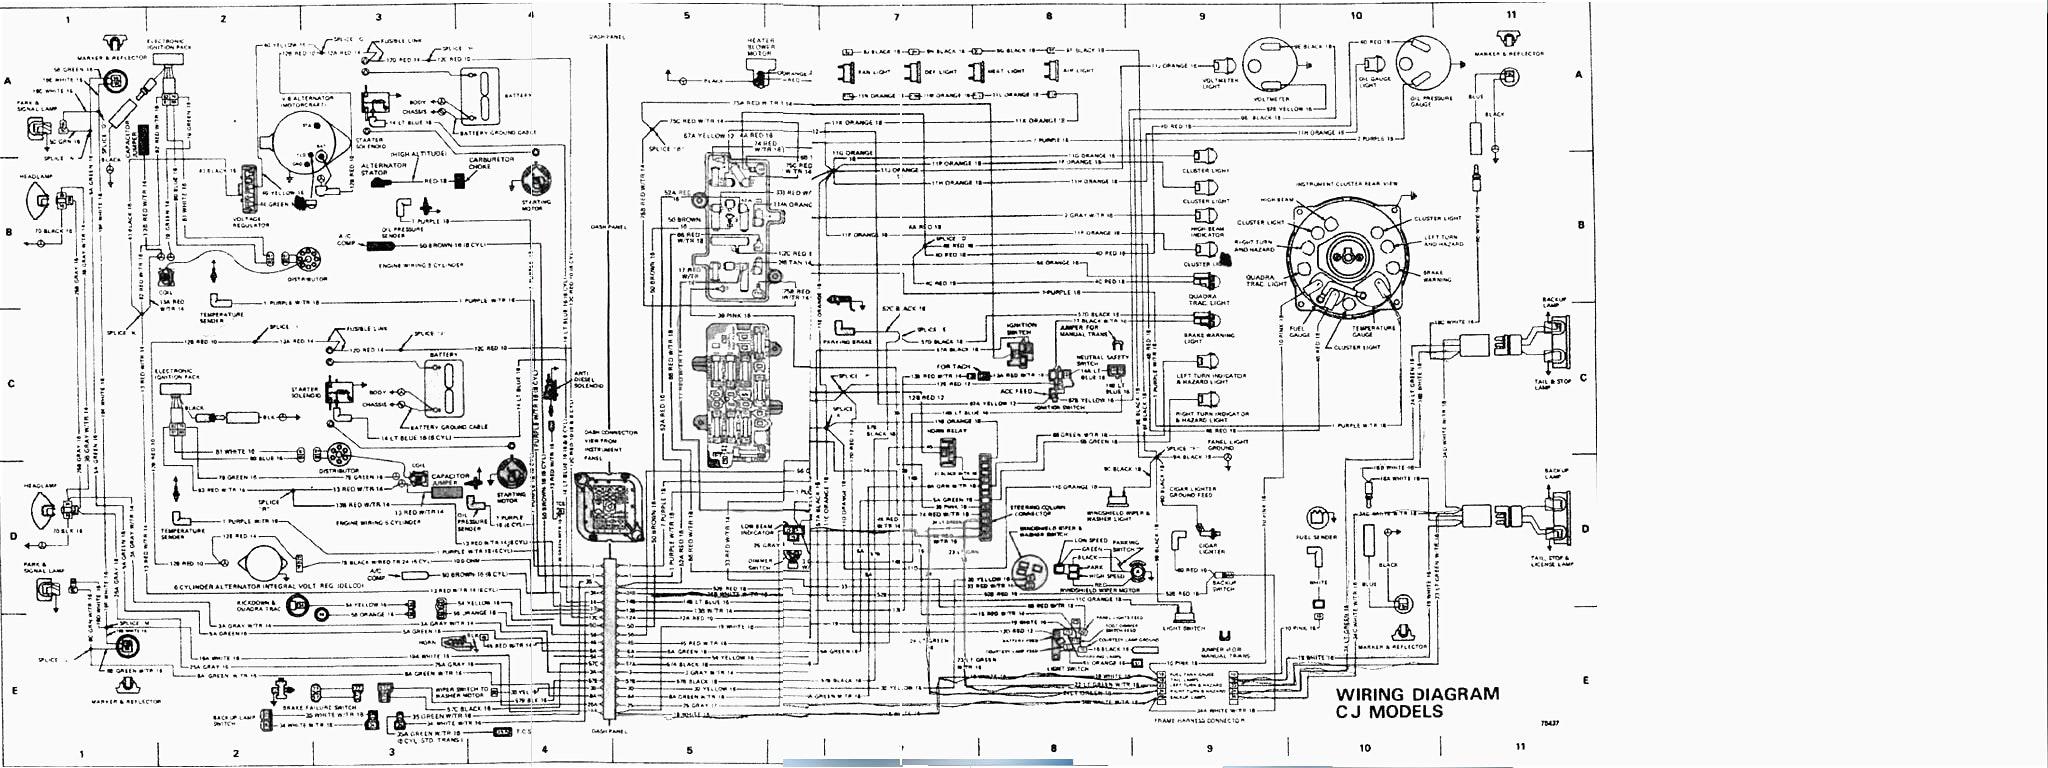 jeep cj7 wiring schematic 85 jeep cj7 wiring diagram wiring diagram data 1979 jeep cj7 wiring diagram 85 jeep cj7 wiring diagram wiring